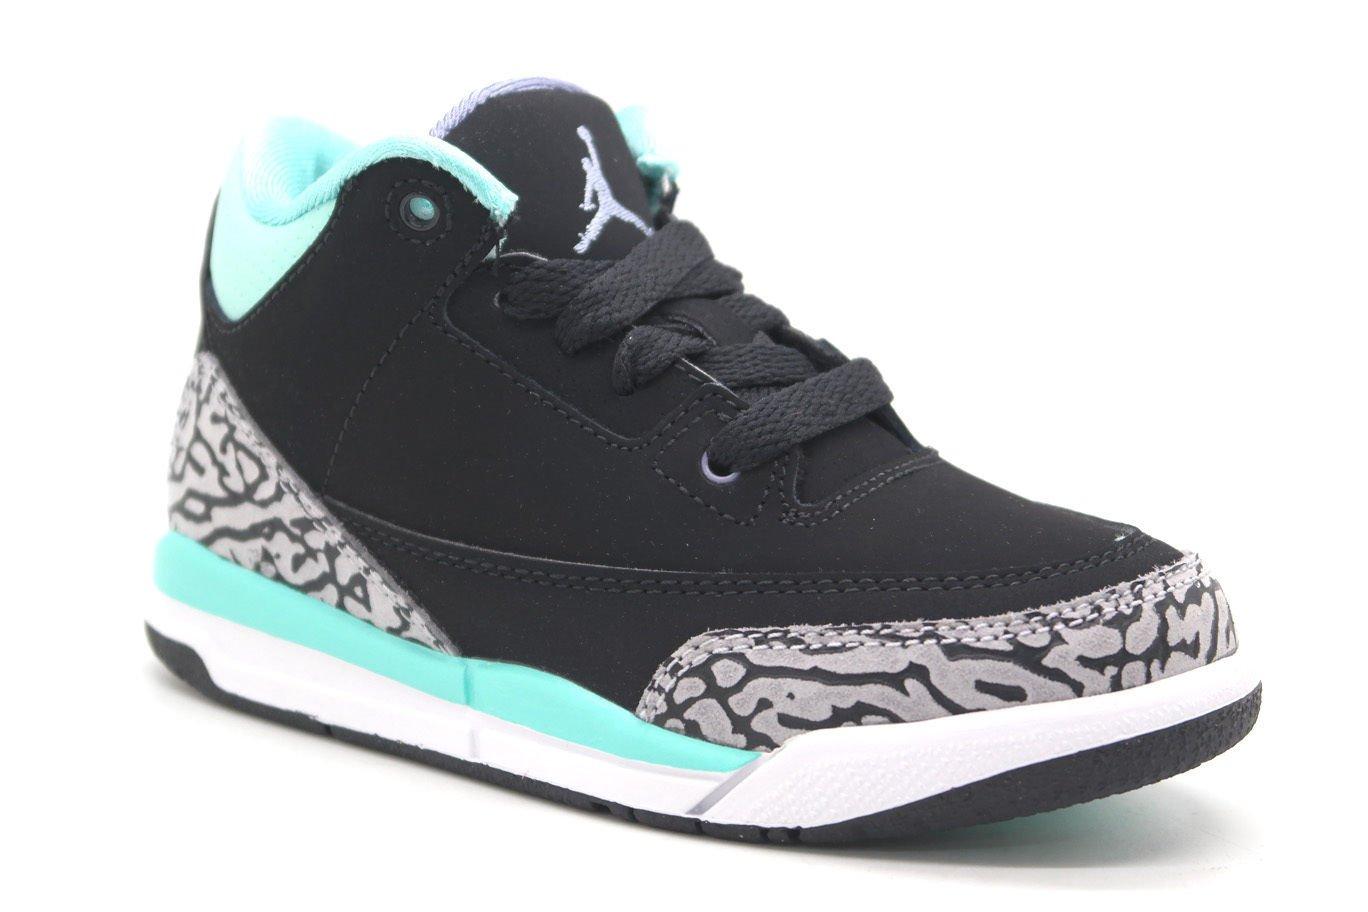 Nike Jordan 3 Retro GP Infant/Todder Basketball Shoes 441141-045 (13.5) by NIKE